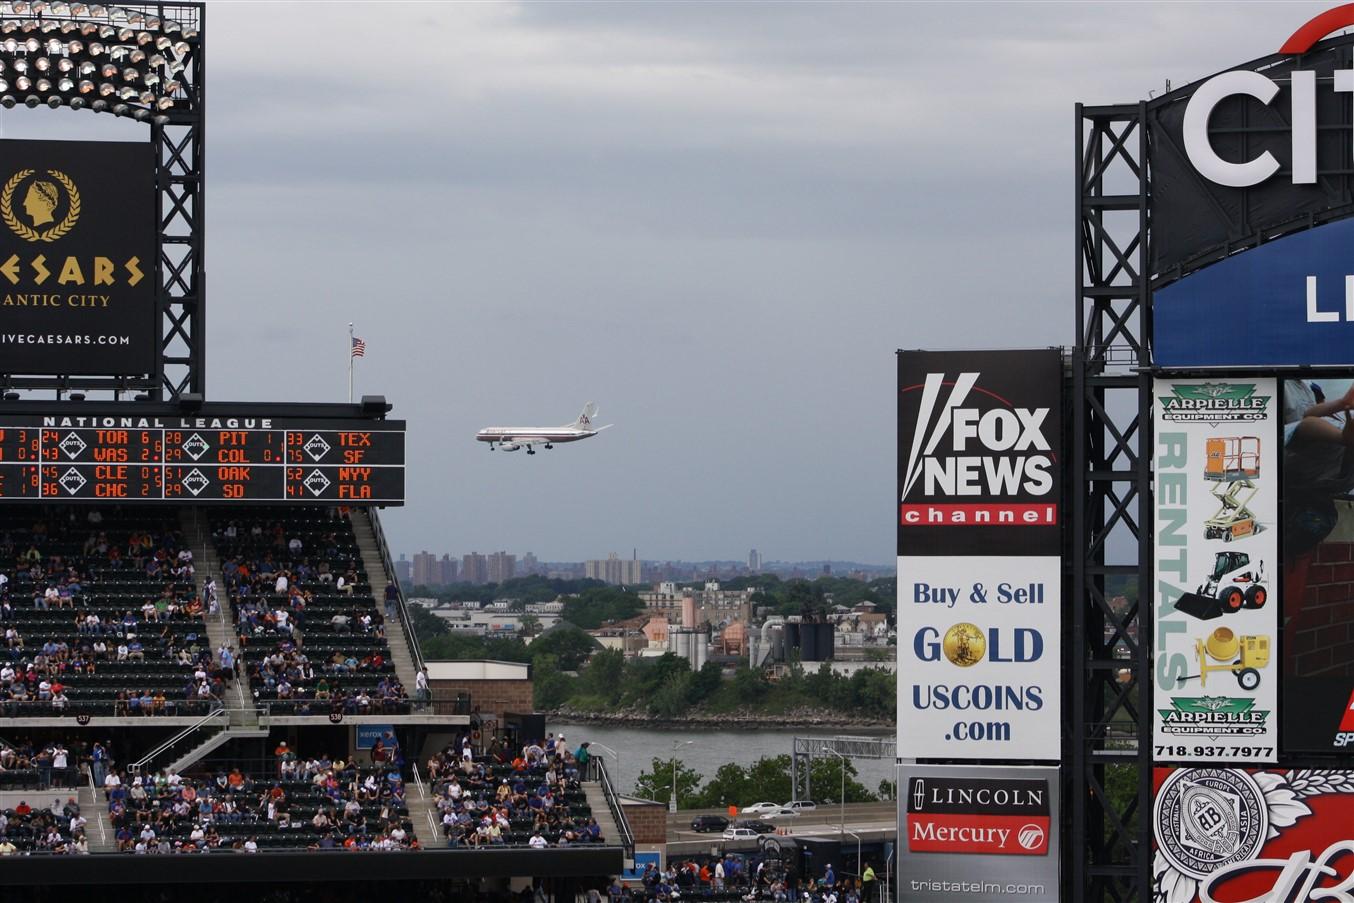 2009 06 21 Law School Road Trip Day 6 New York Mets 133.jpg